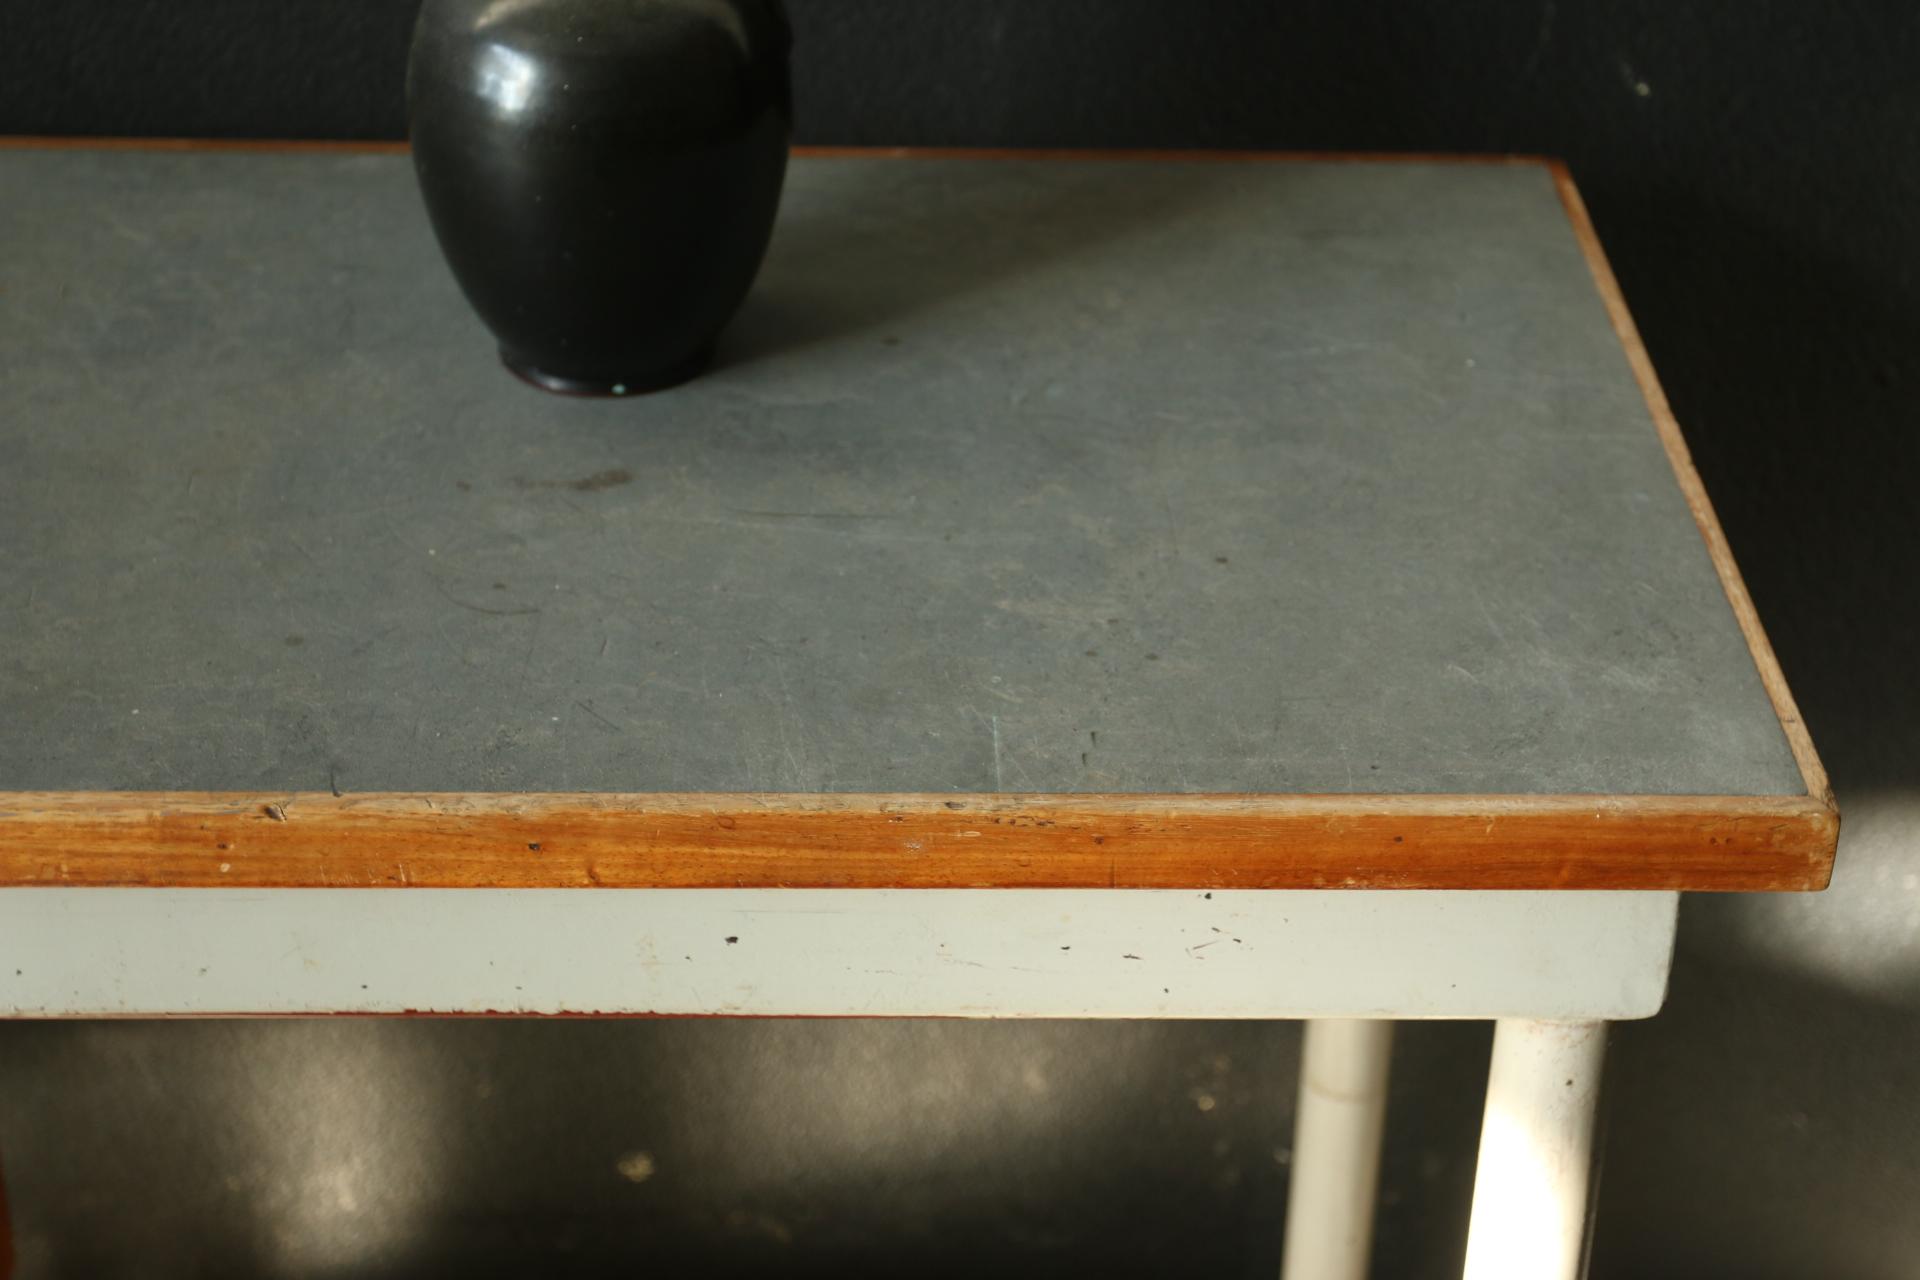 Halfronde Tafel Sidetable : Sidetable u2013 dehuiszwaluw